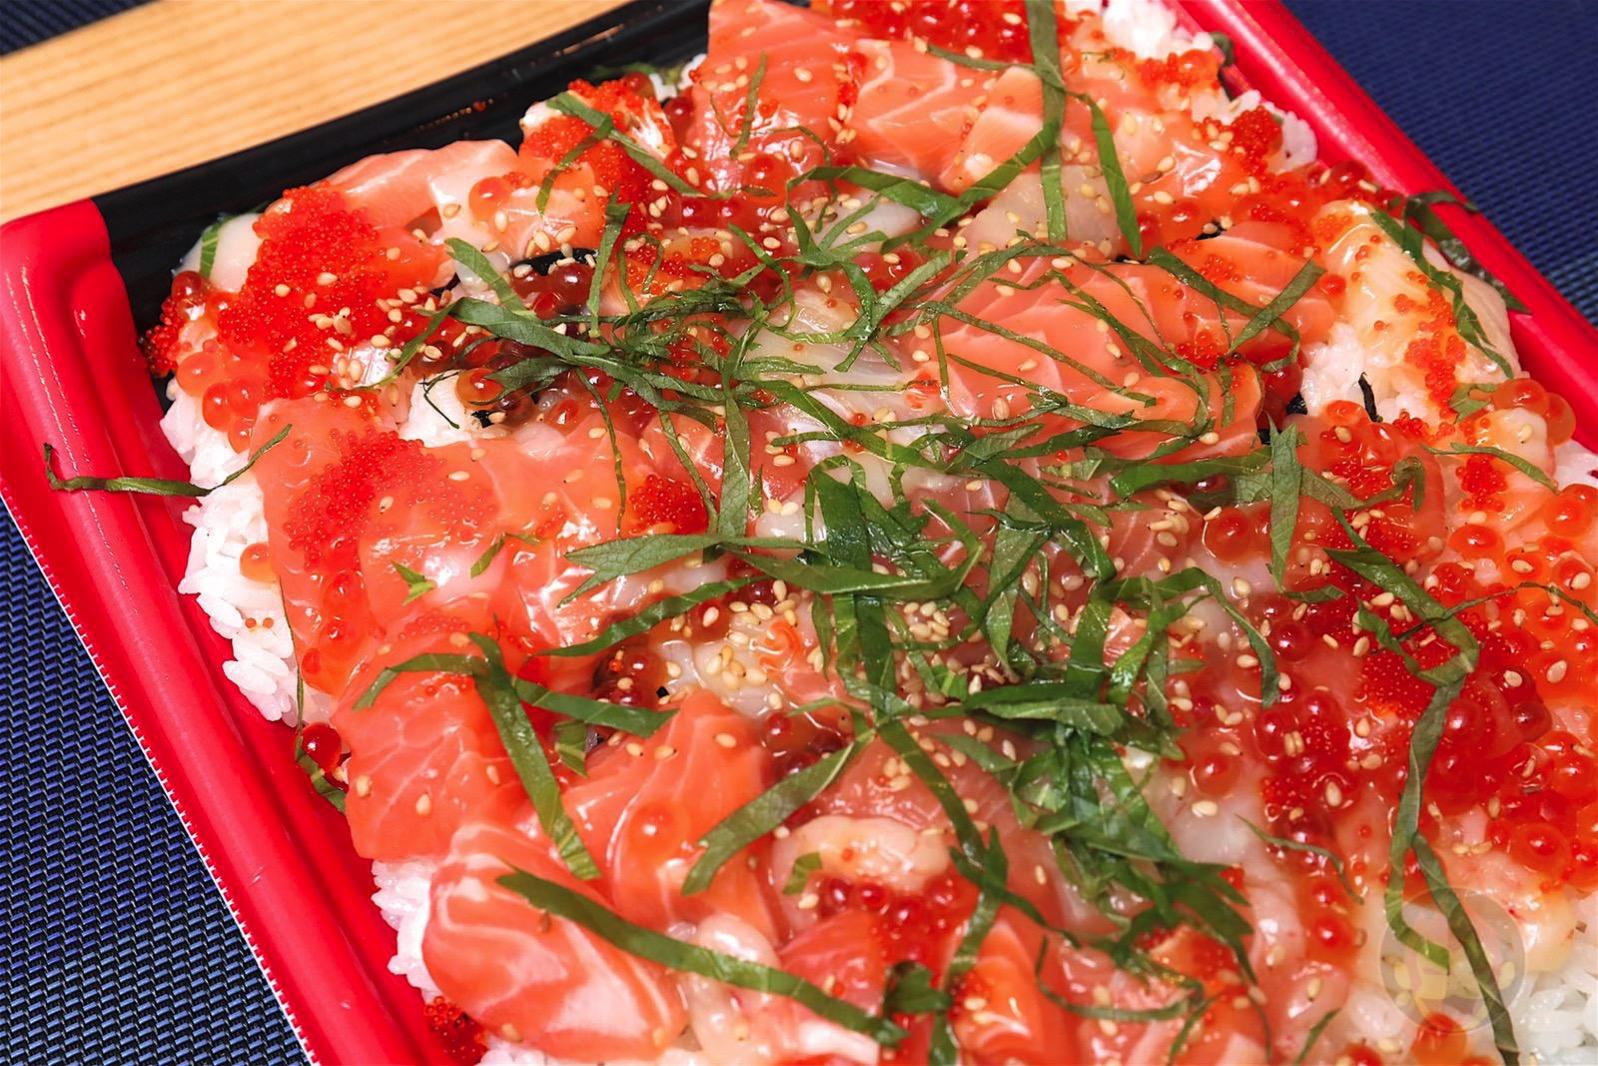 Costco Chirashi Sushi Platter 04